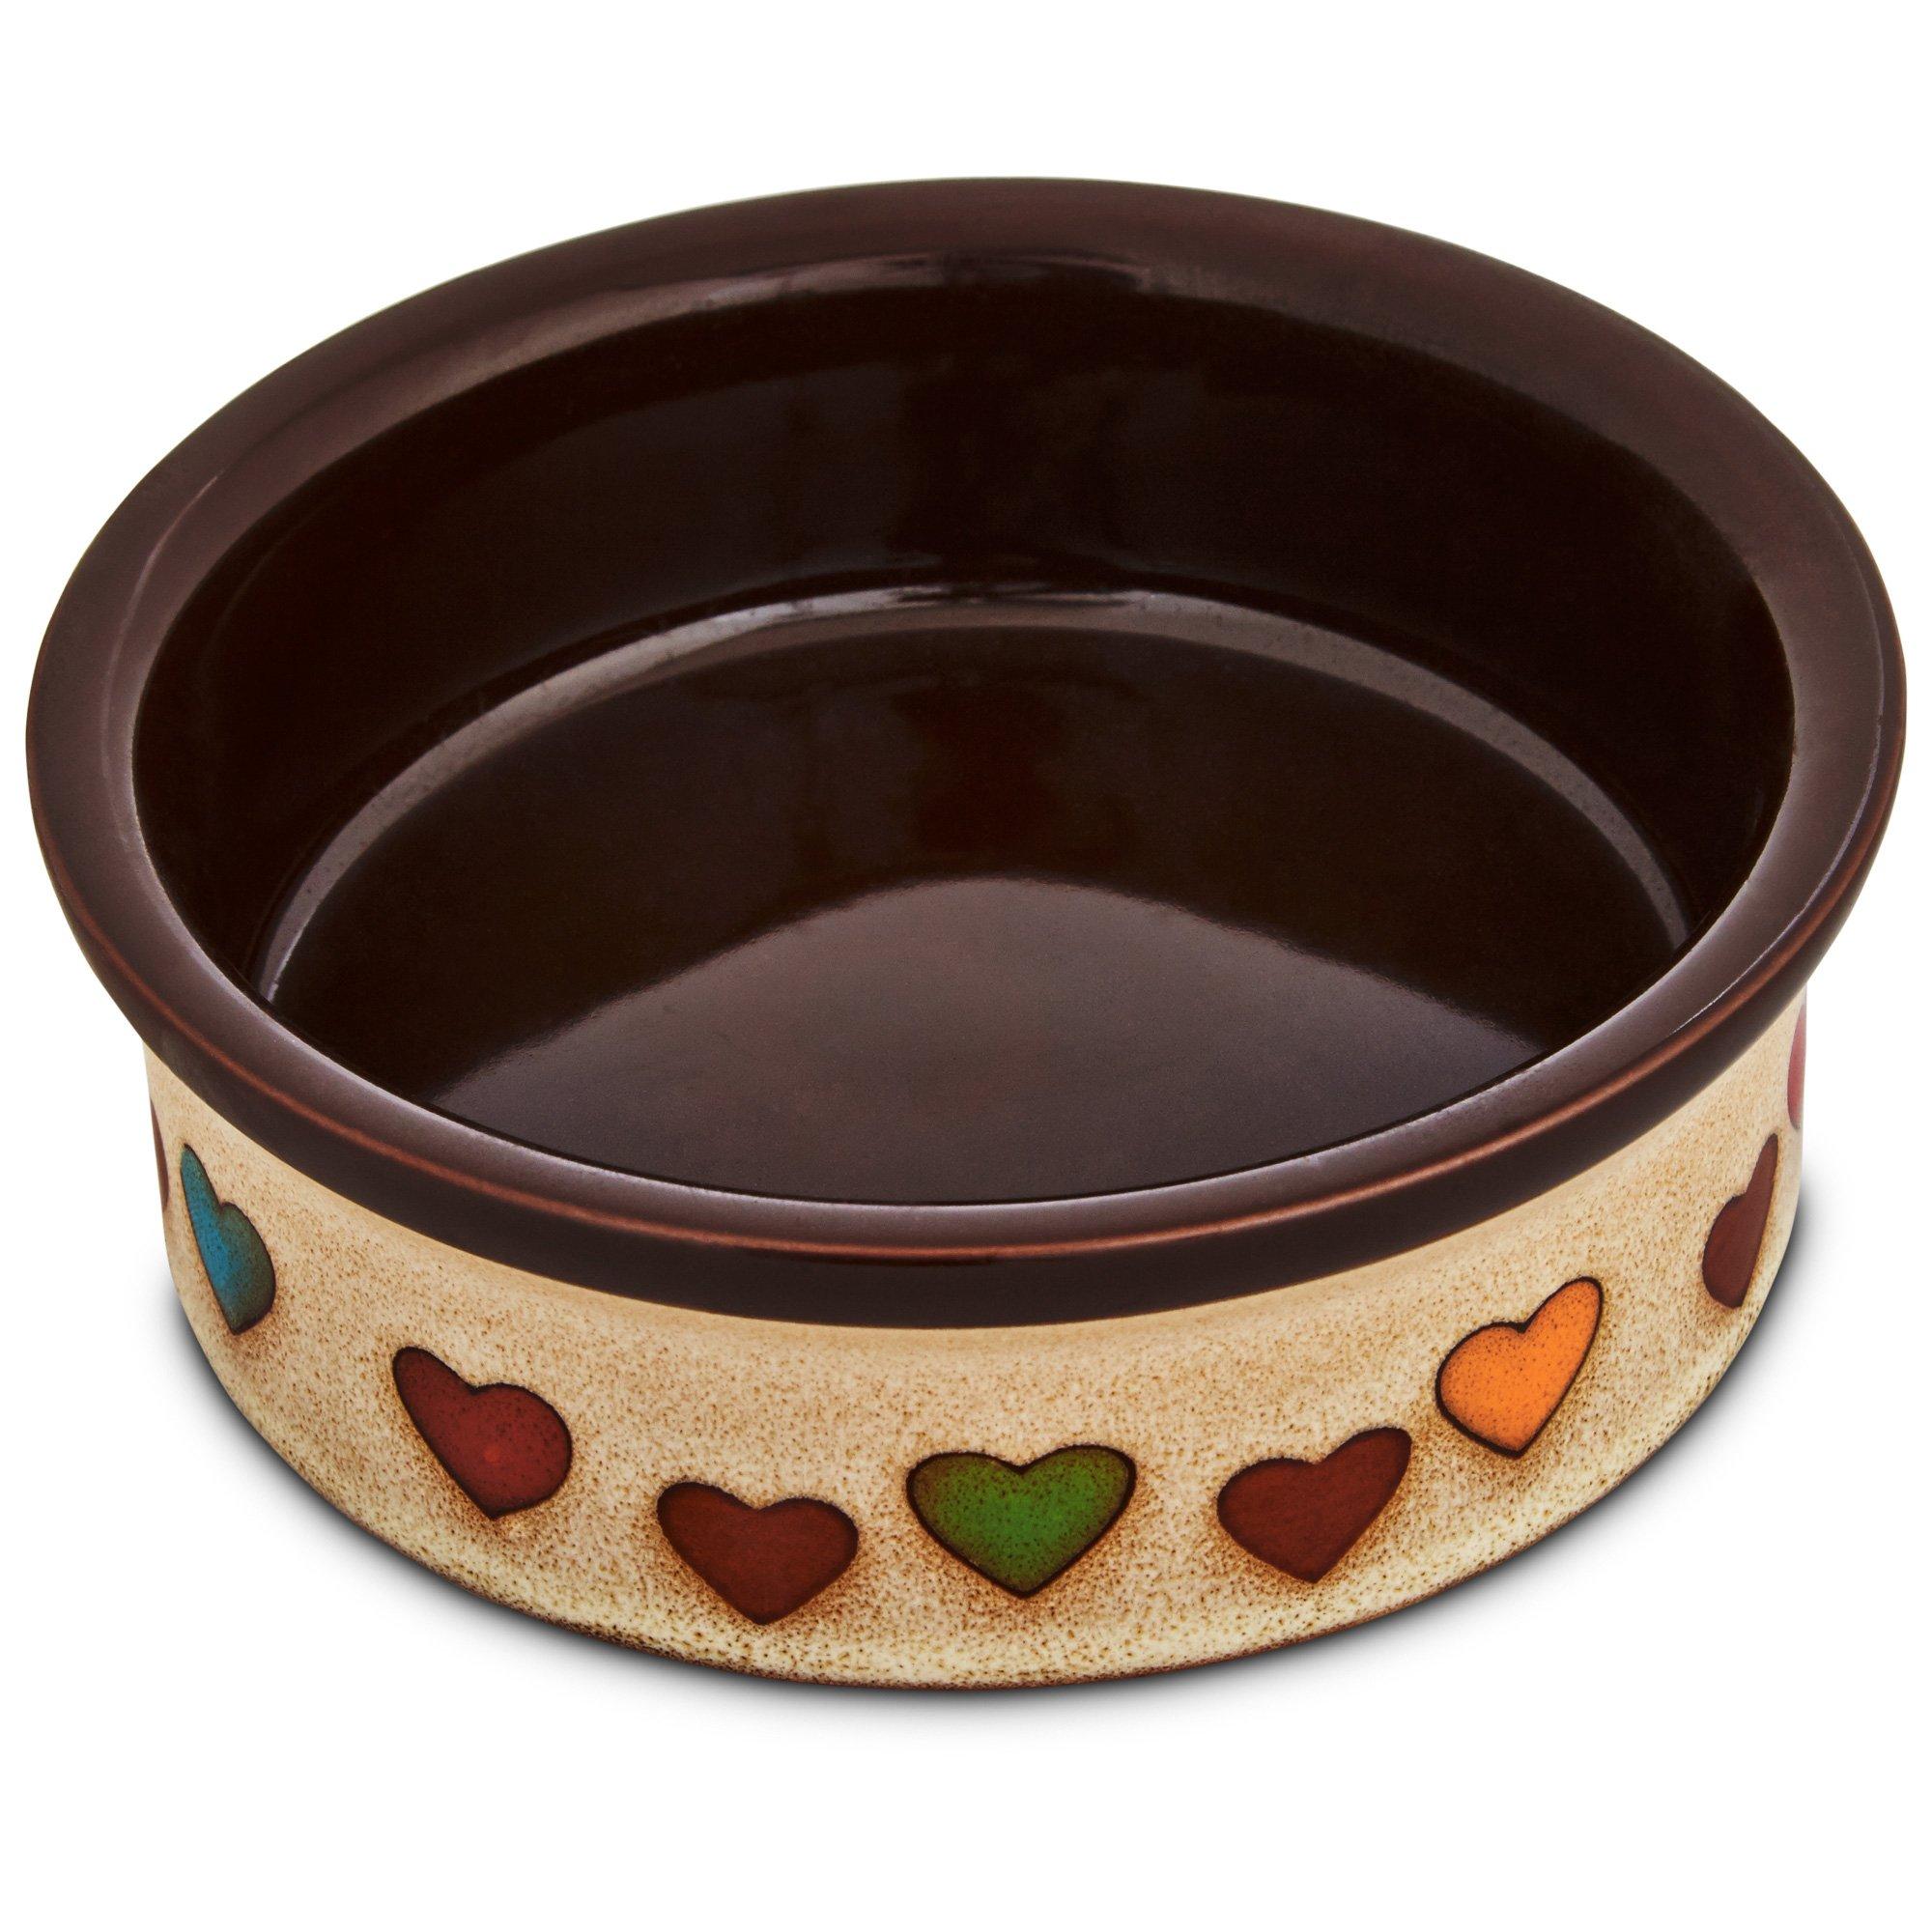 Harmony Heart Print Brown Ceramic Dog Bowl Petco